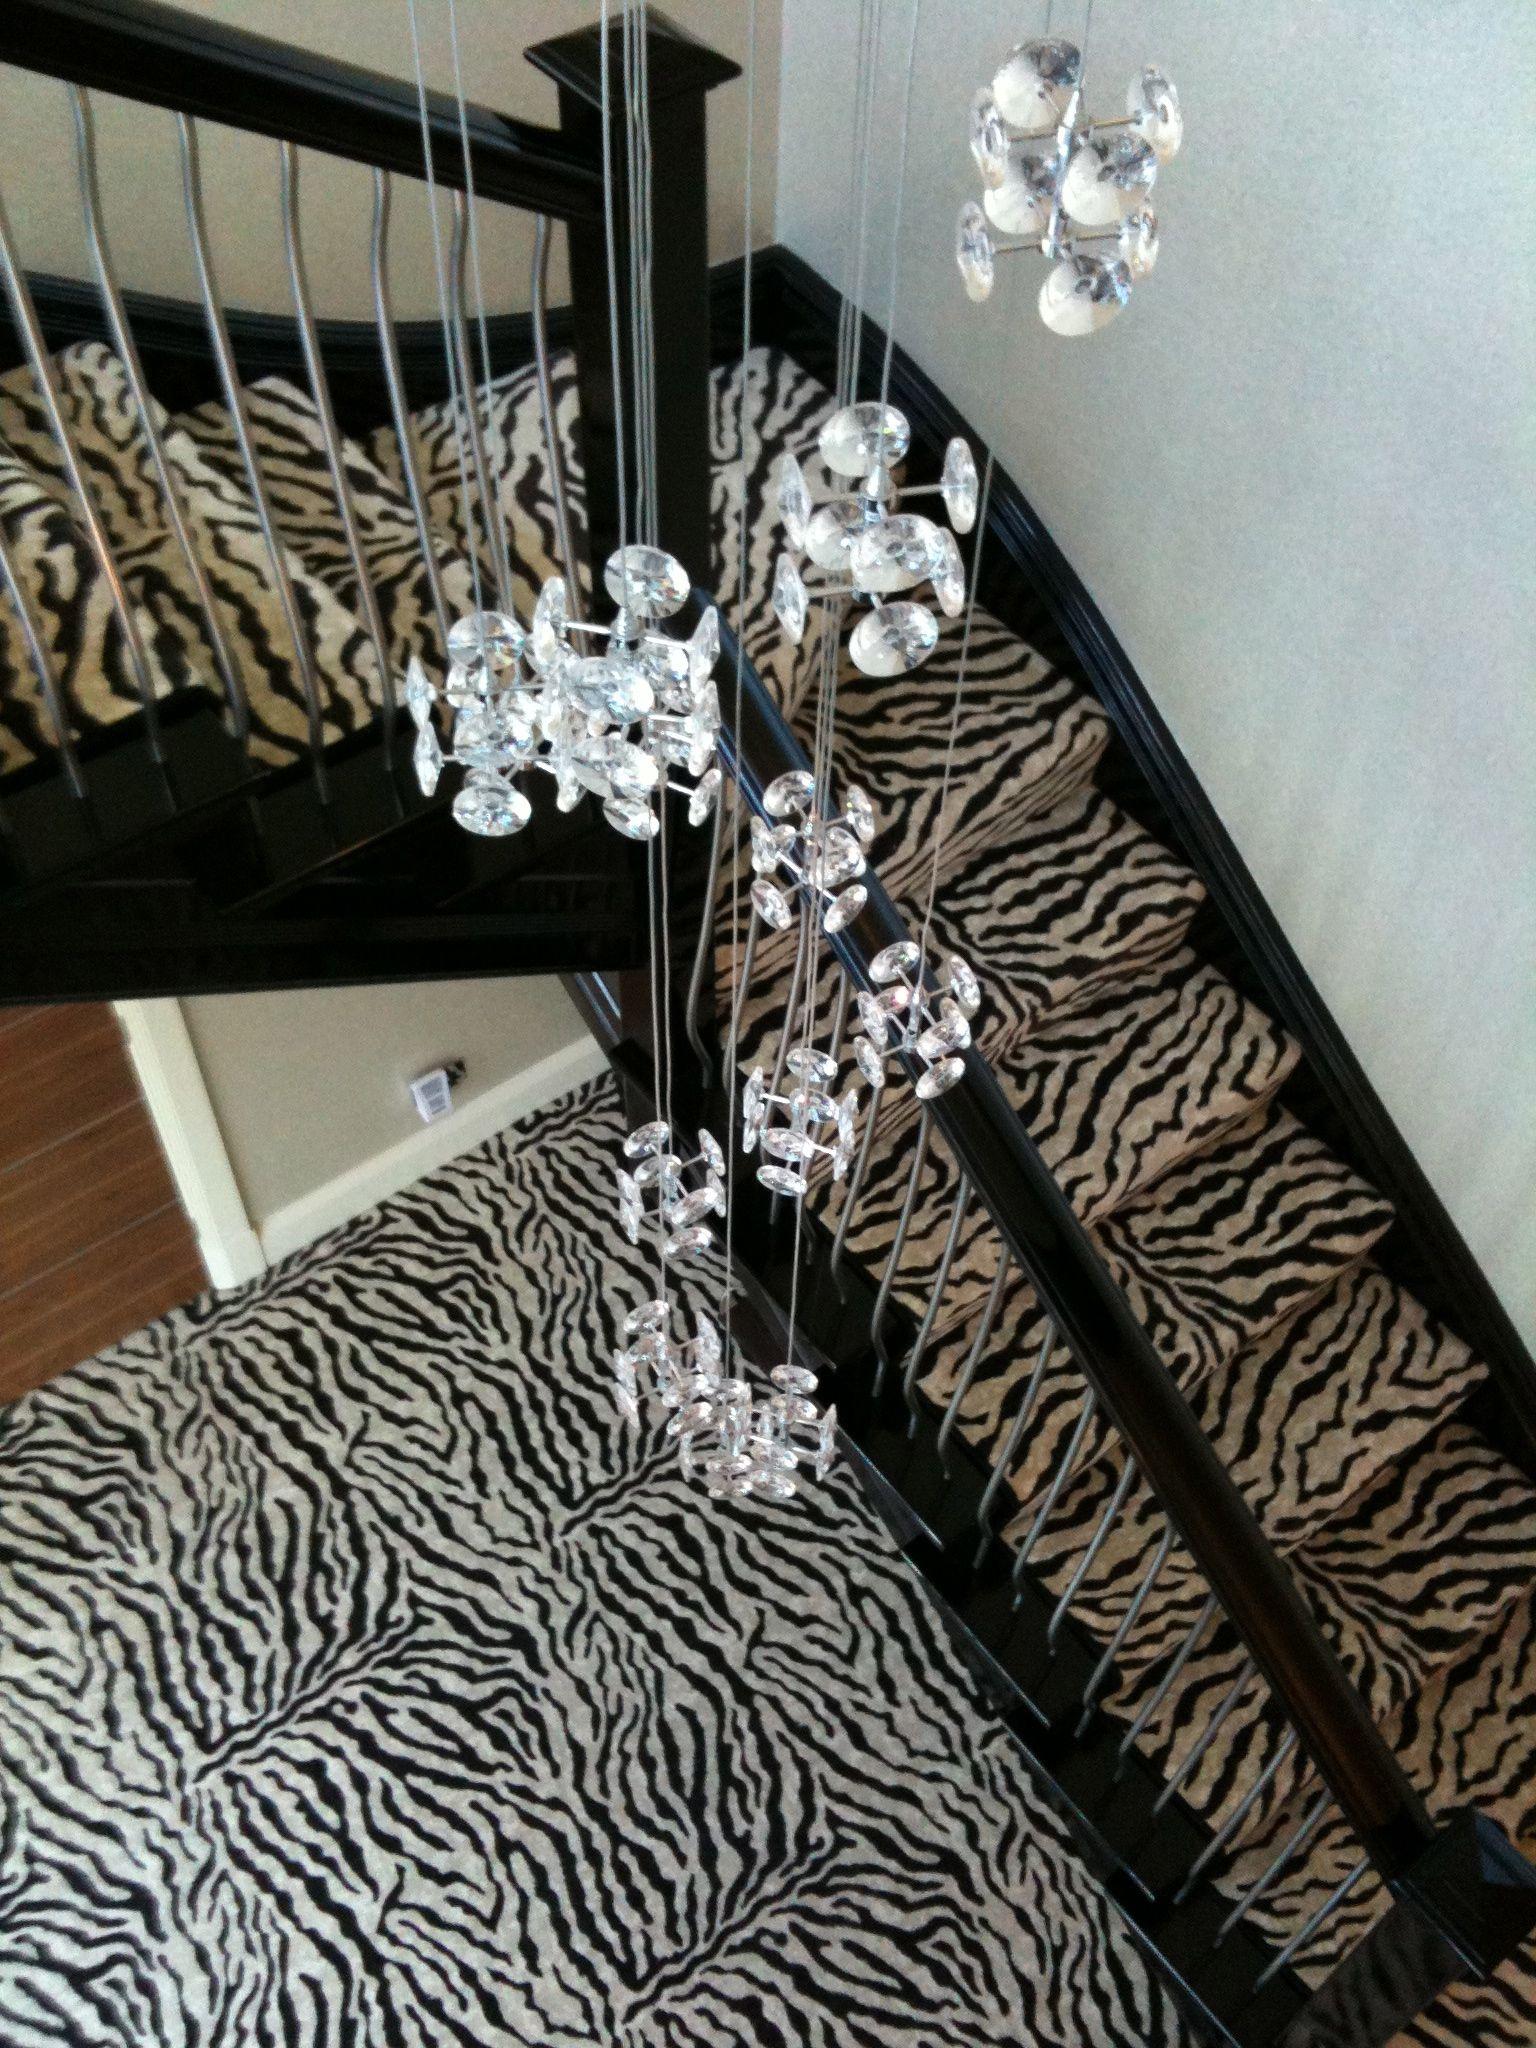 Best Zebra Print Carpet 3 66M Zebra Print Carpet Printed 400 x 300